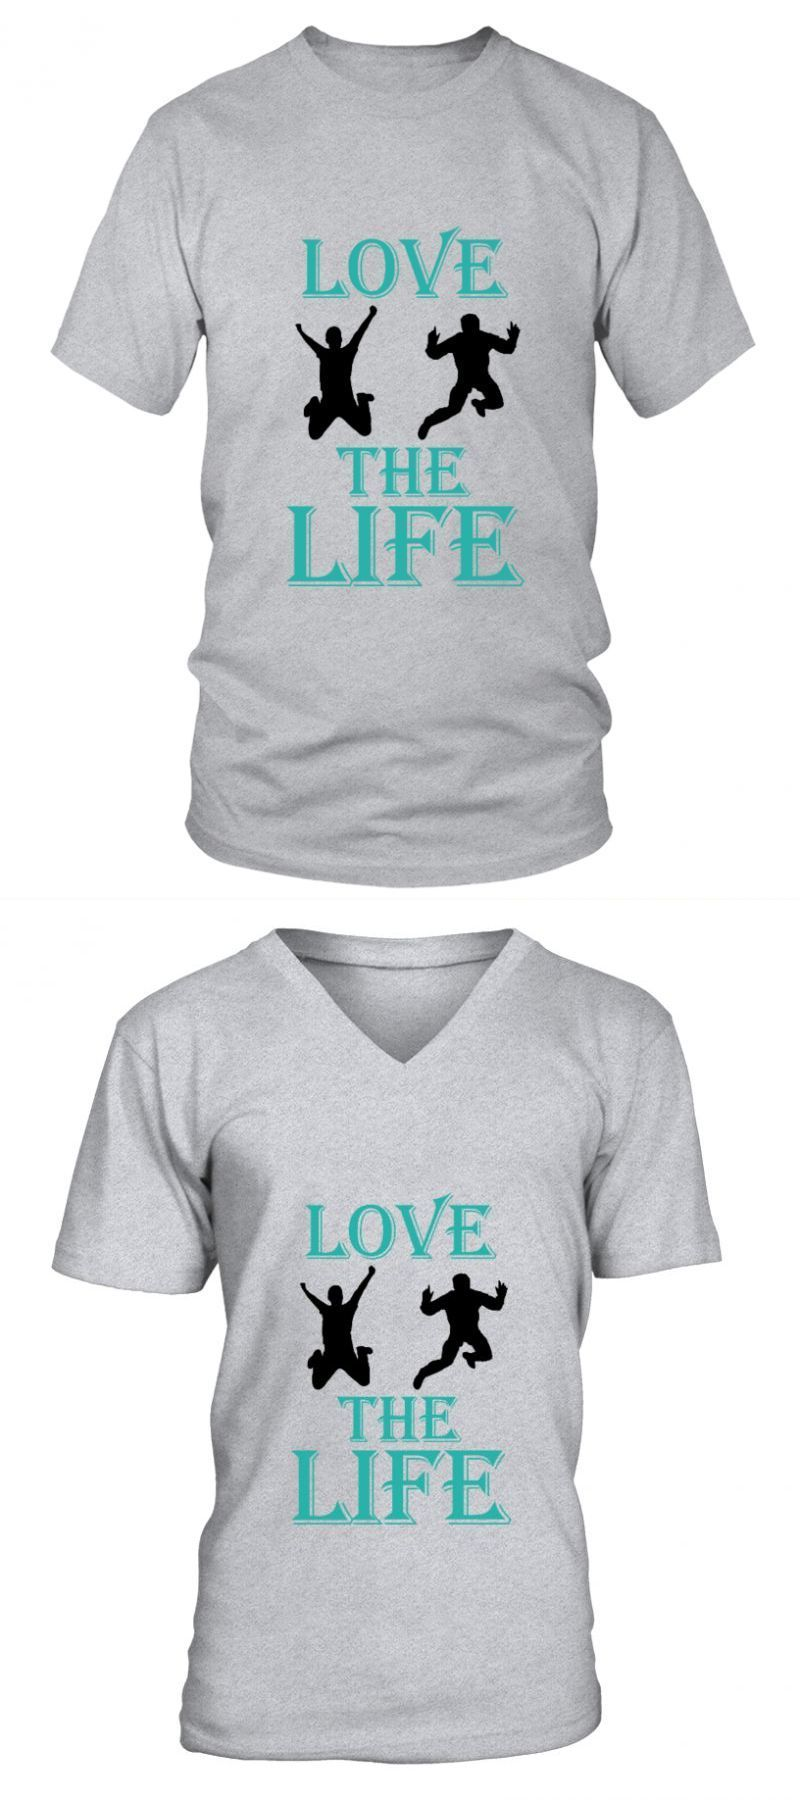 Trail Running T Shirt Designs Limited Edition Running Man T Shirt